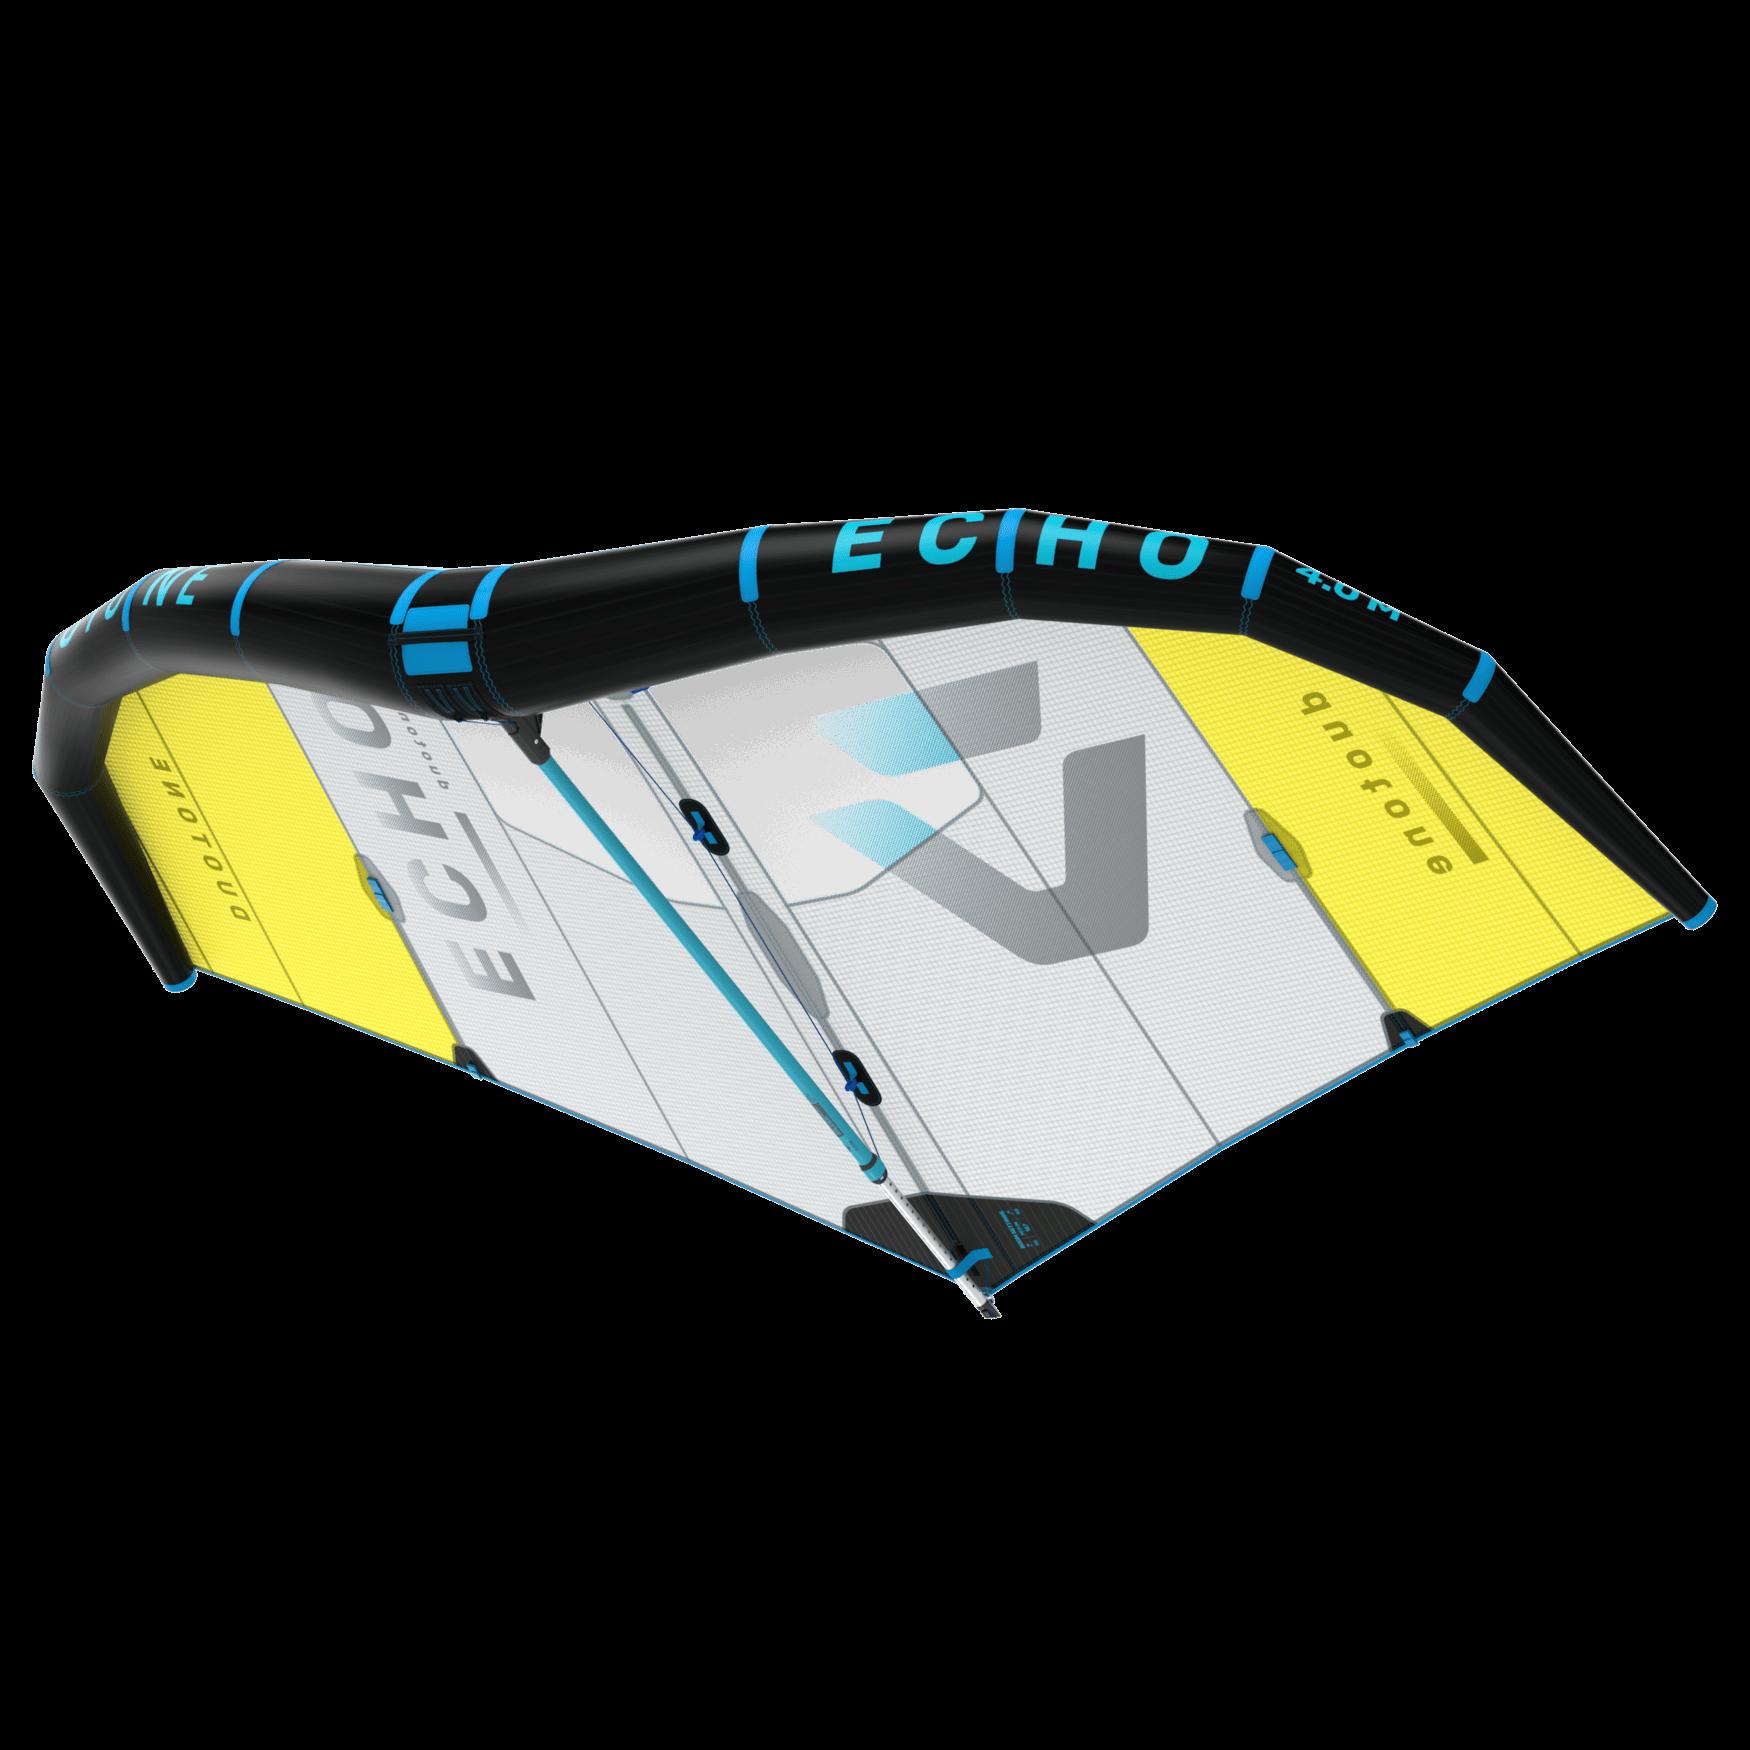 Duotone Foil Wing Echo